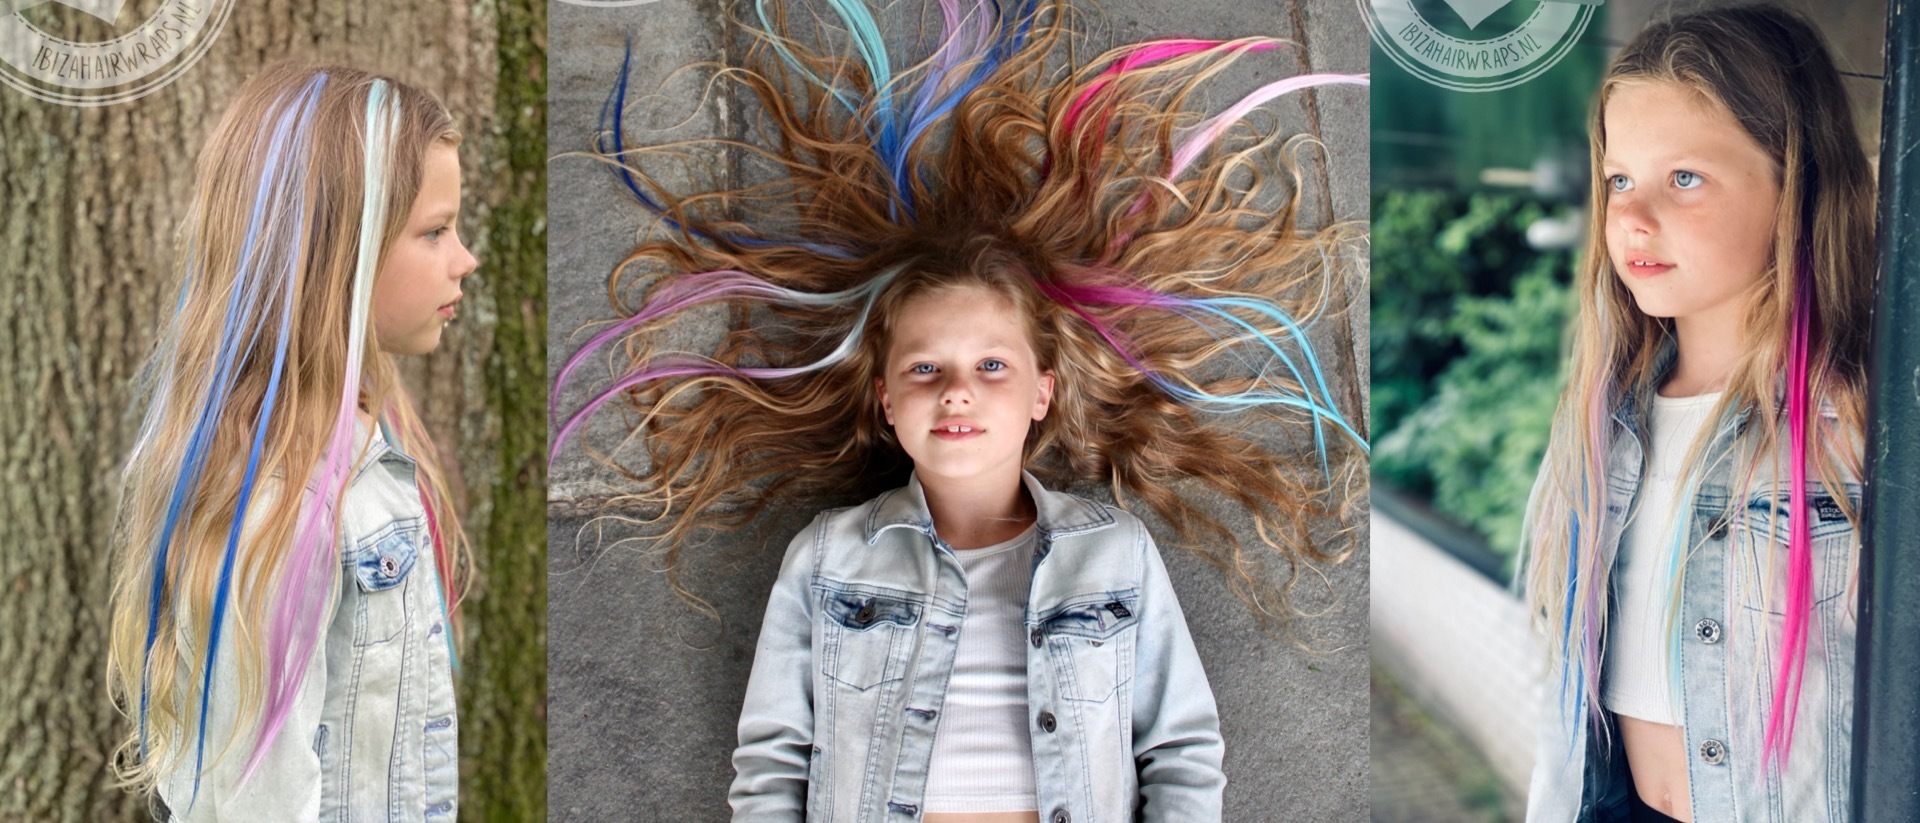 hairextensions clip-inn's lise